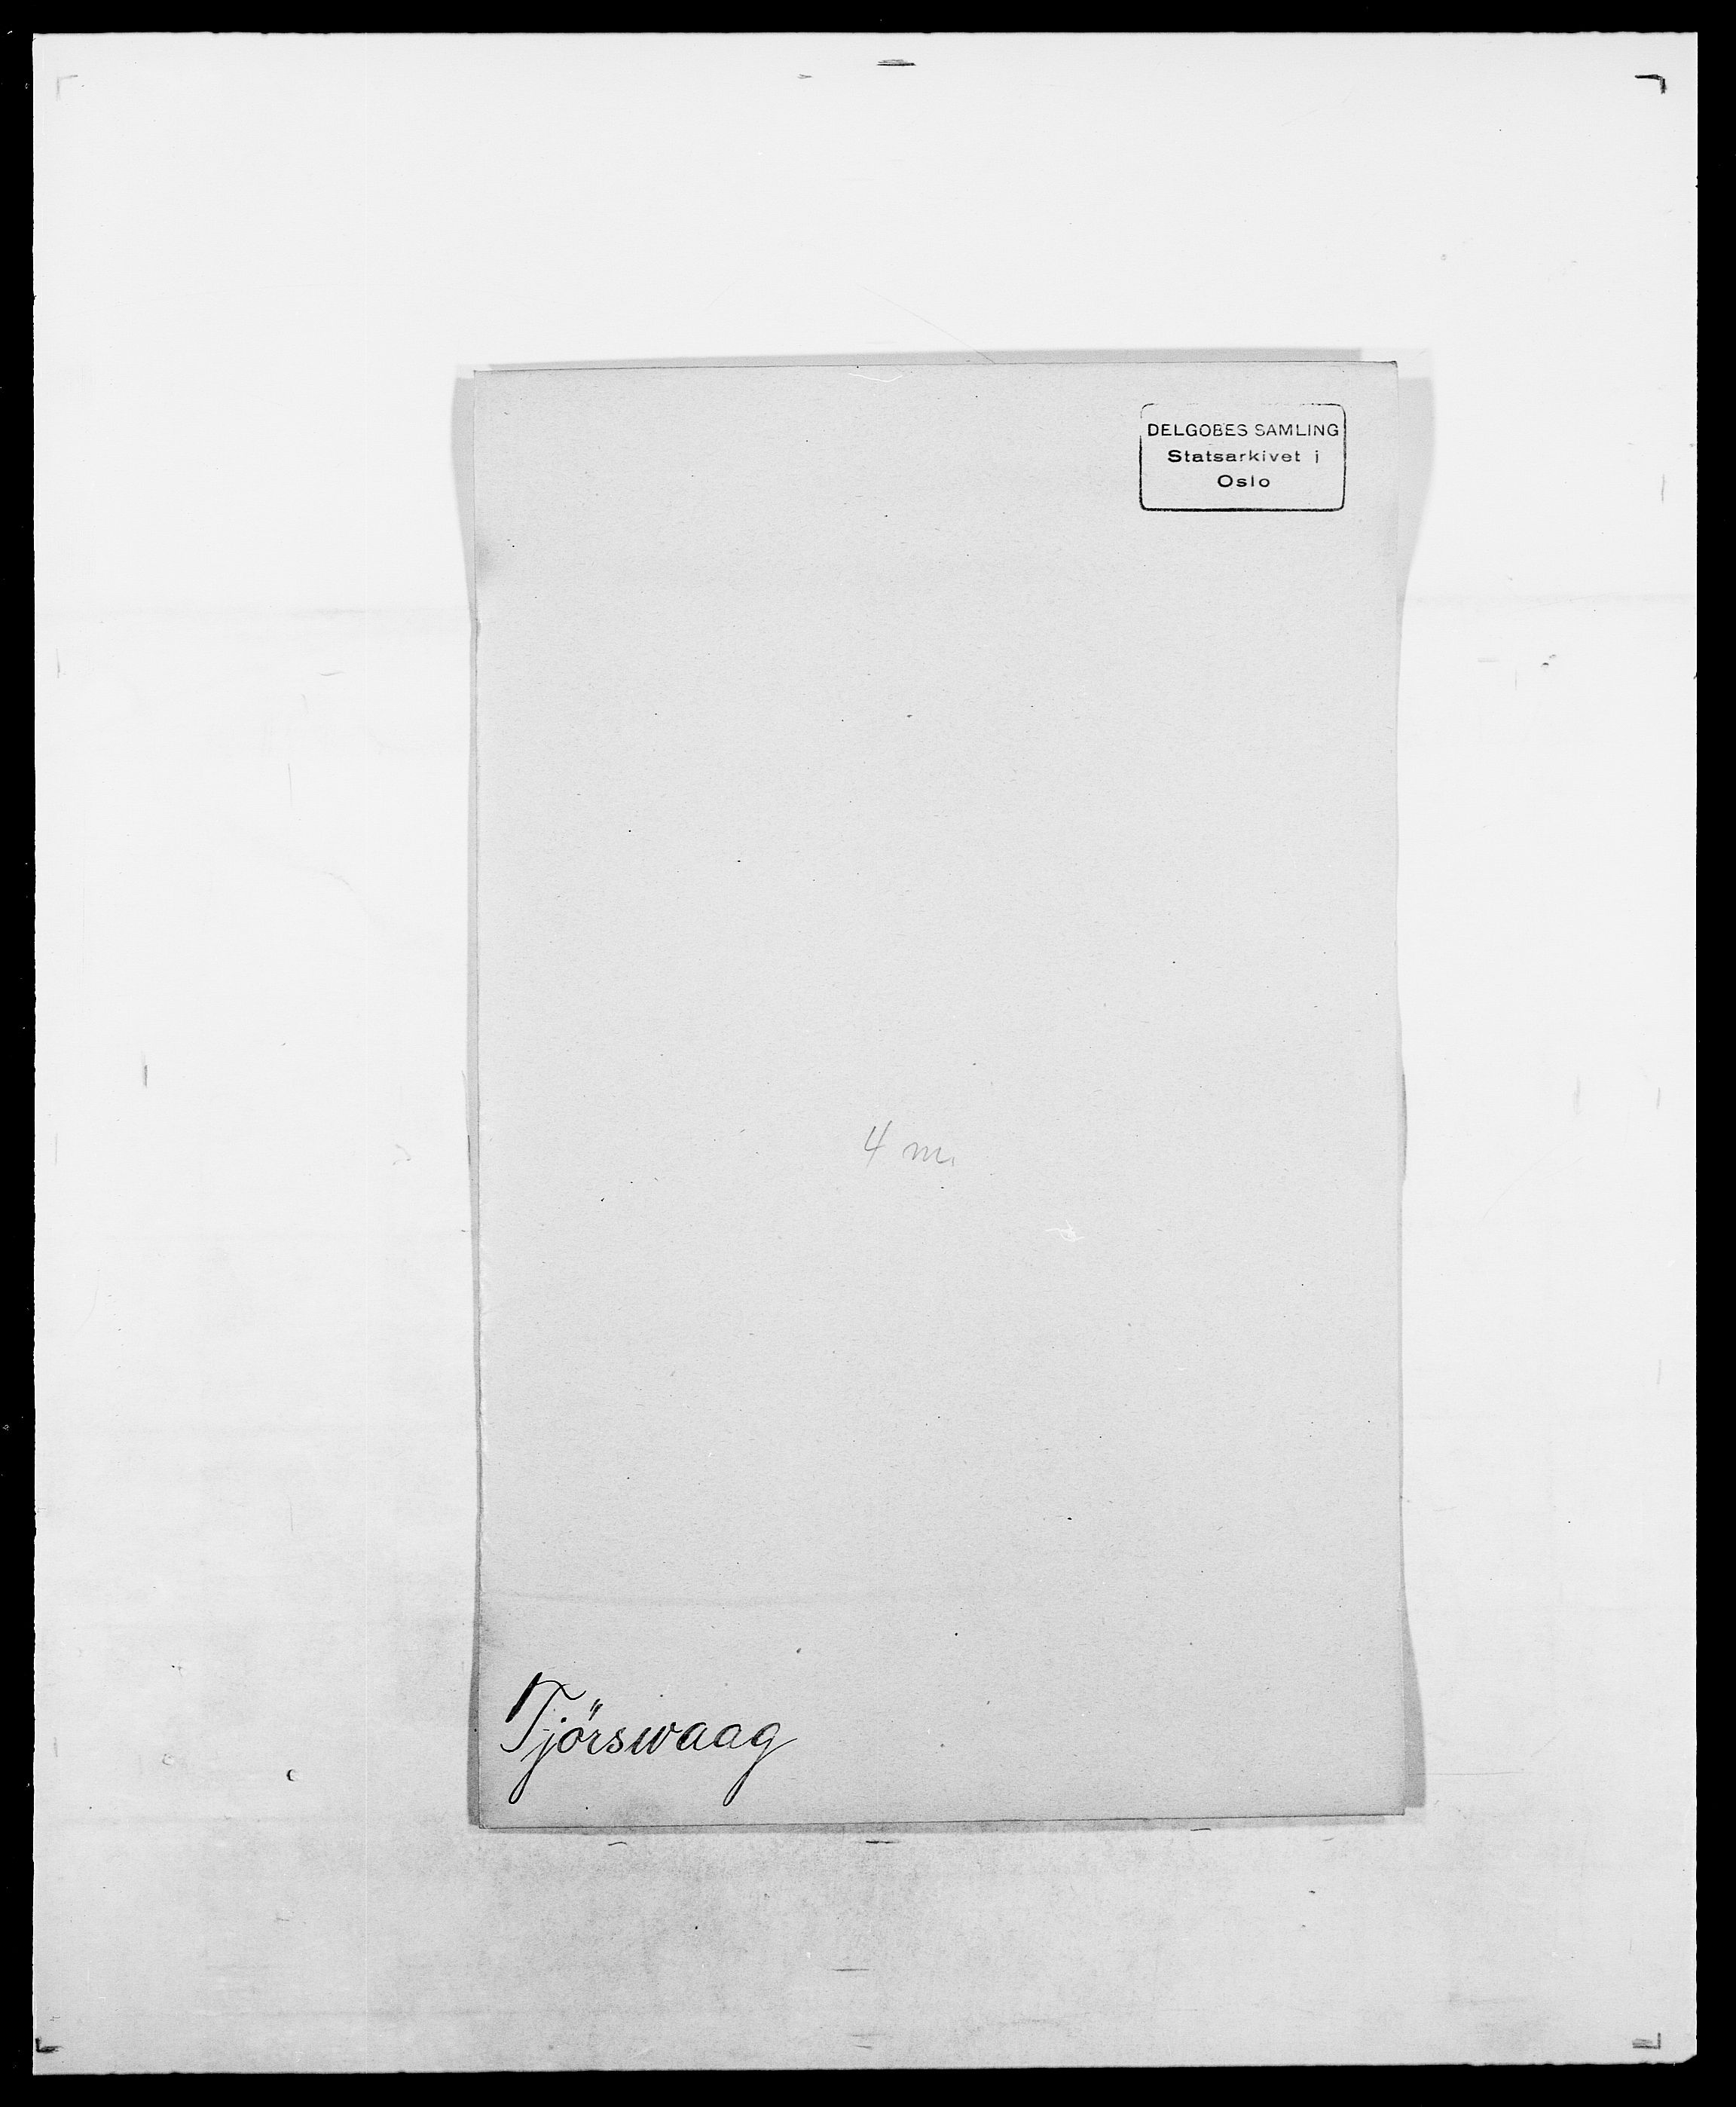 SAO, Delgobe, Charles Antoine - samling, D/Da/L0039: Thorsen - Urup, s. 76